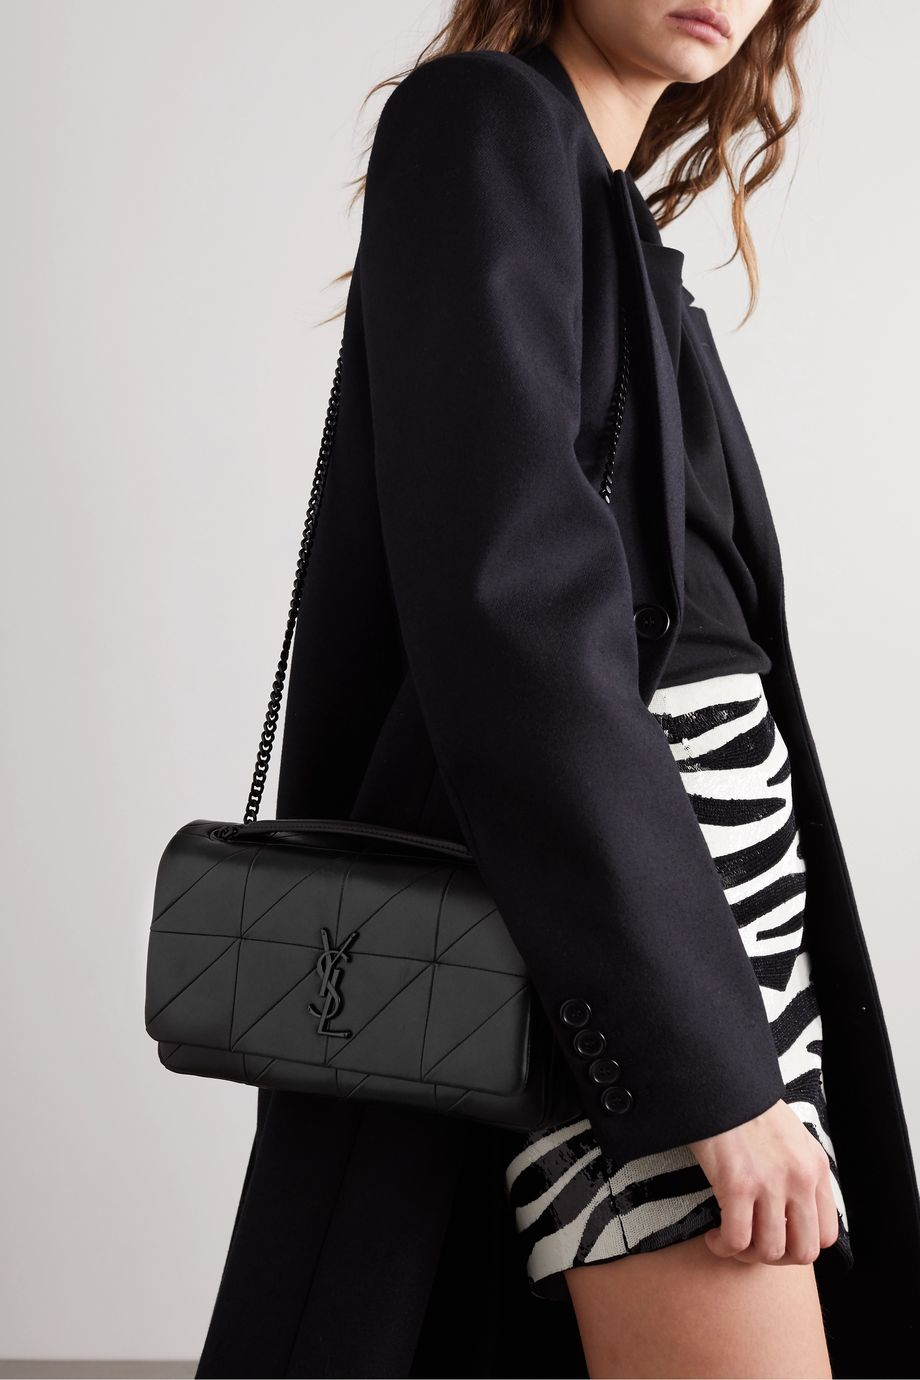 SAINT LAURENT Jamie medium paneled leather shoulder bag